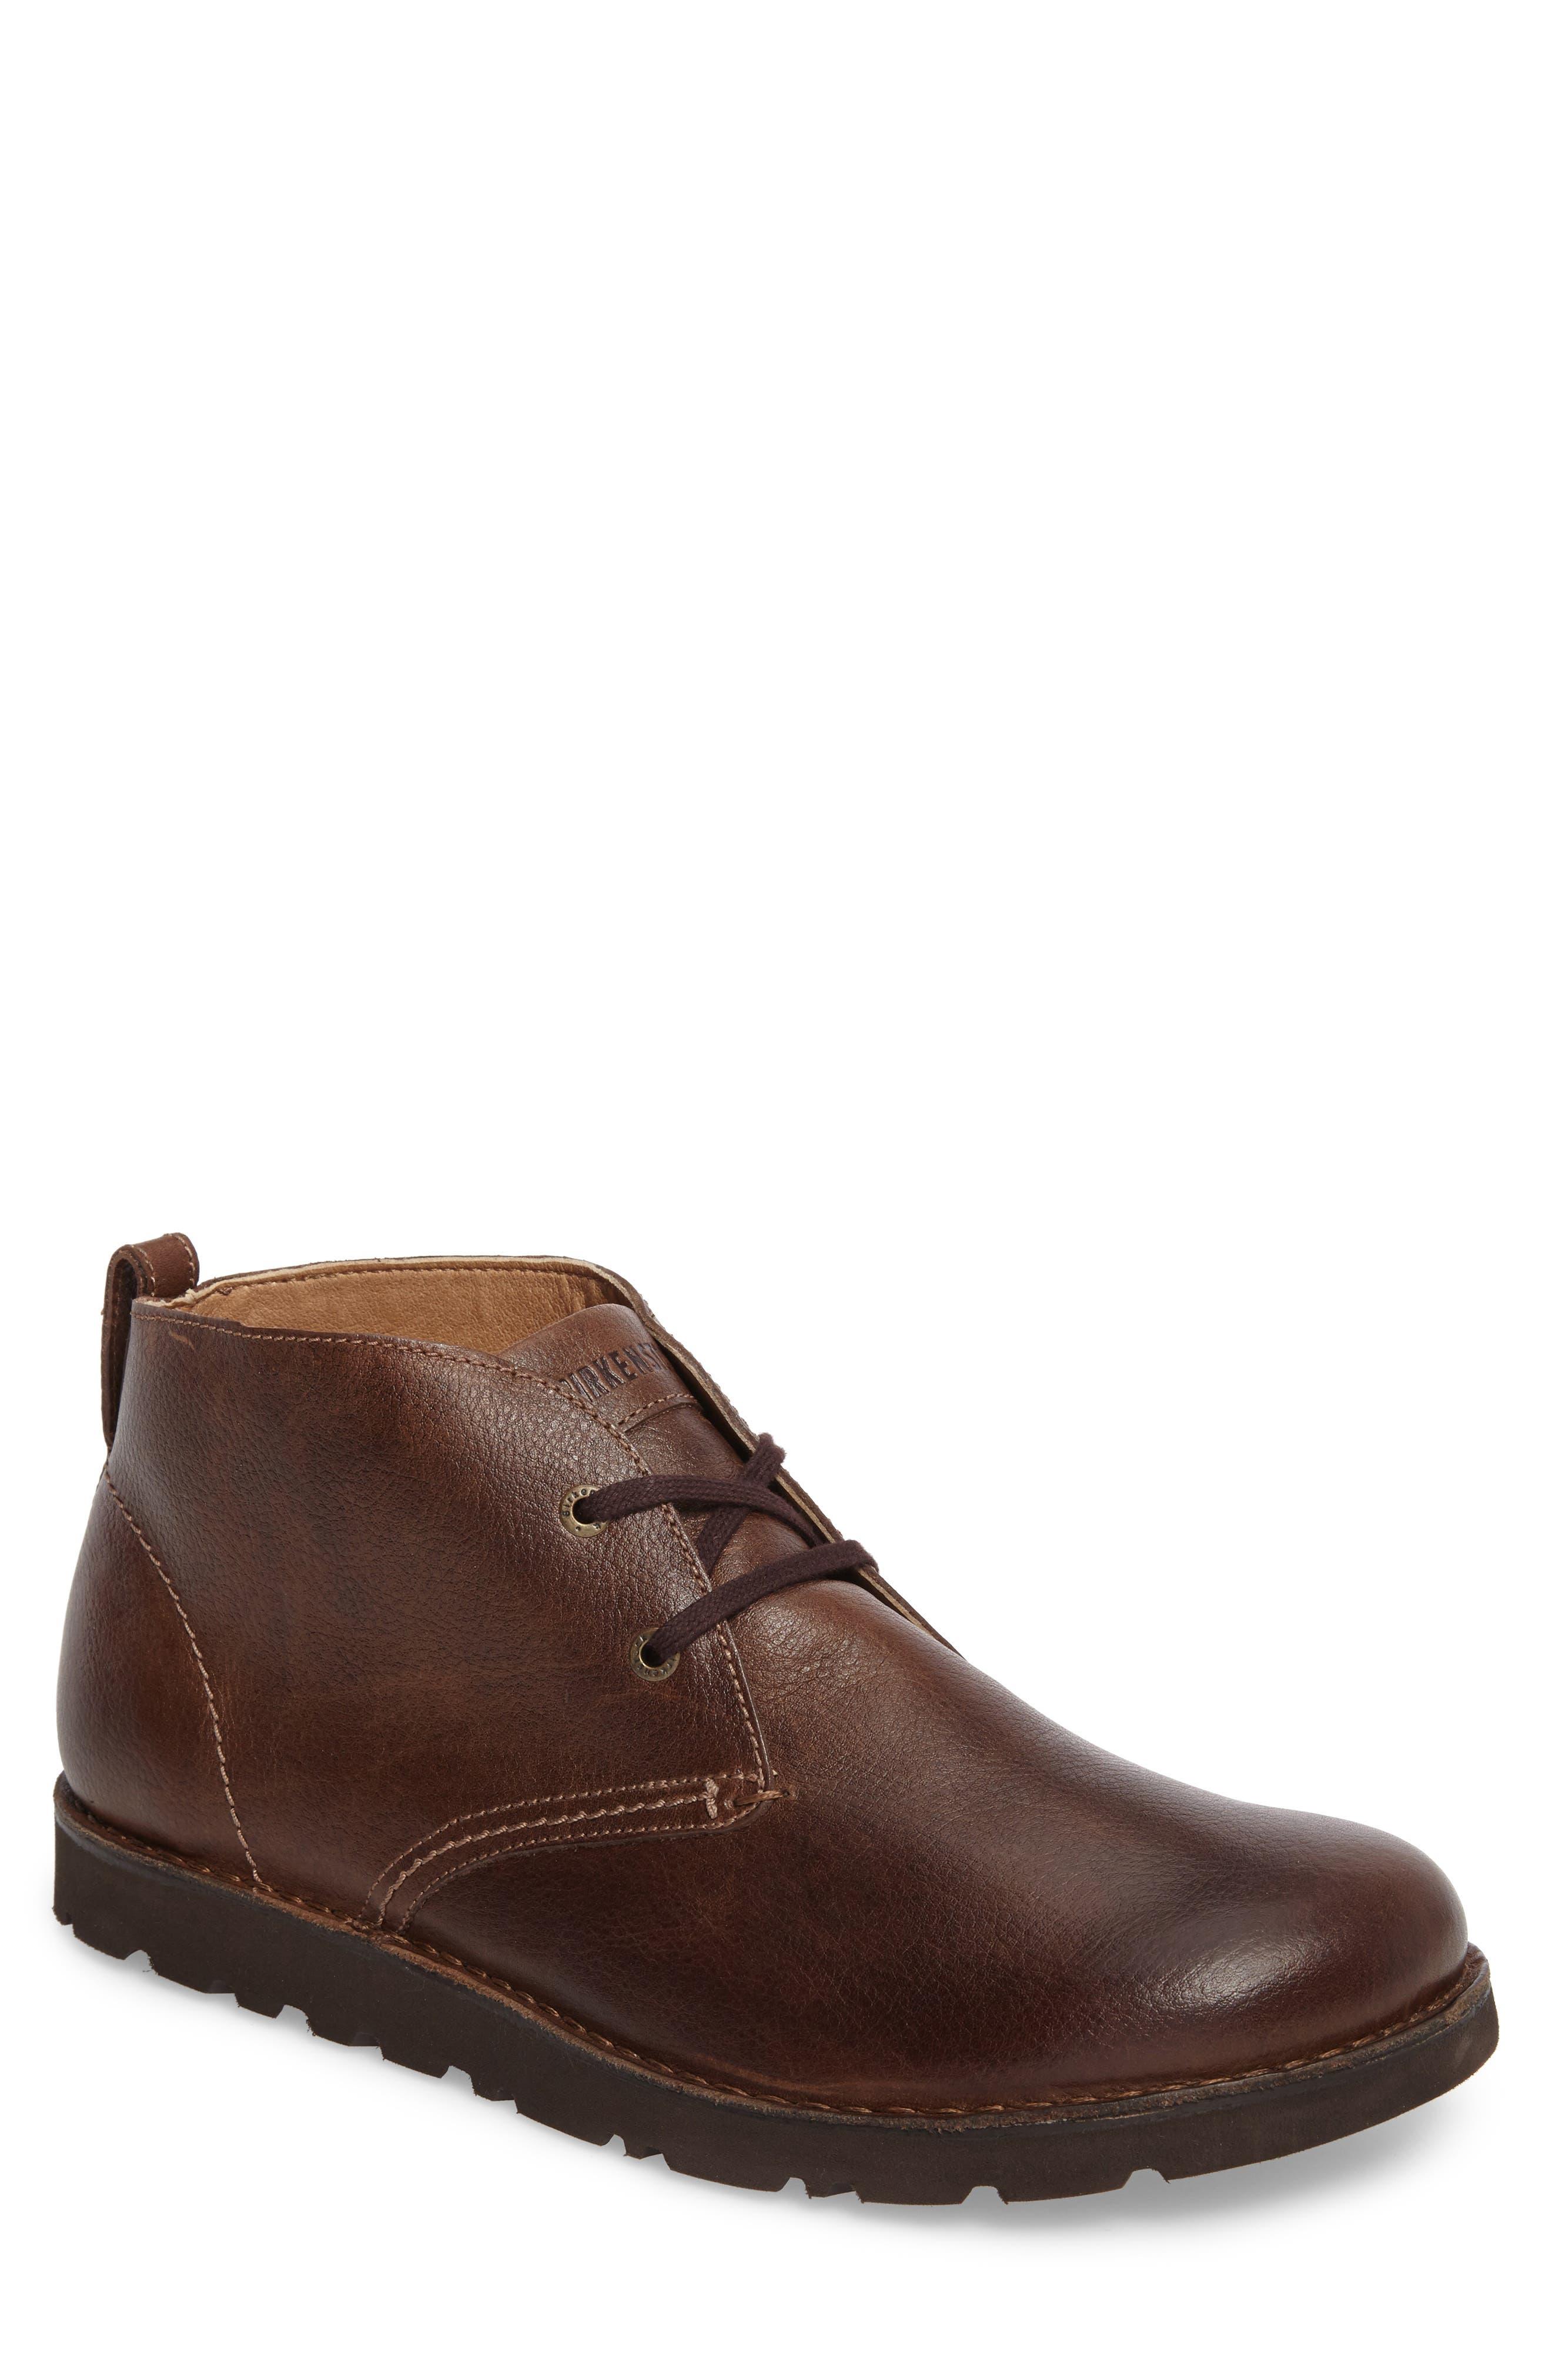 'Harris' Chukka Boot,                         Main,                         color, Brown